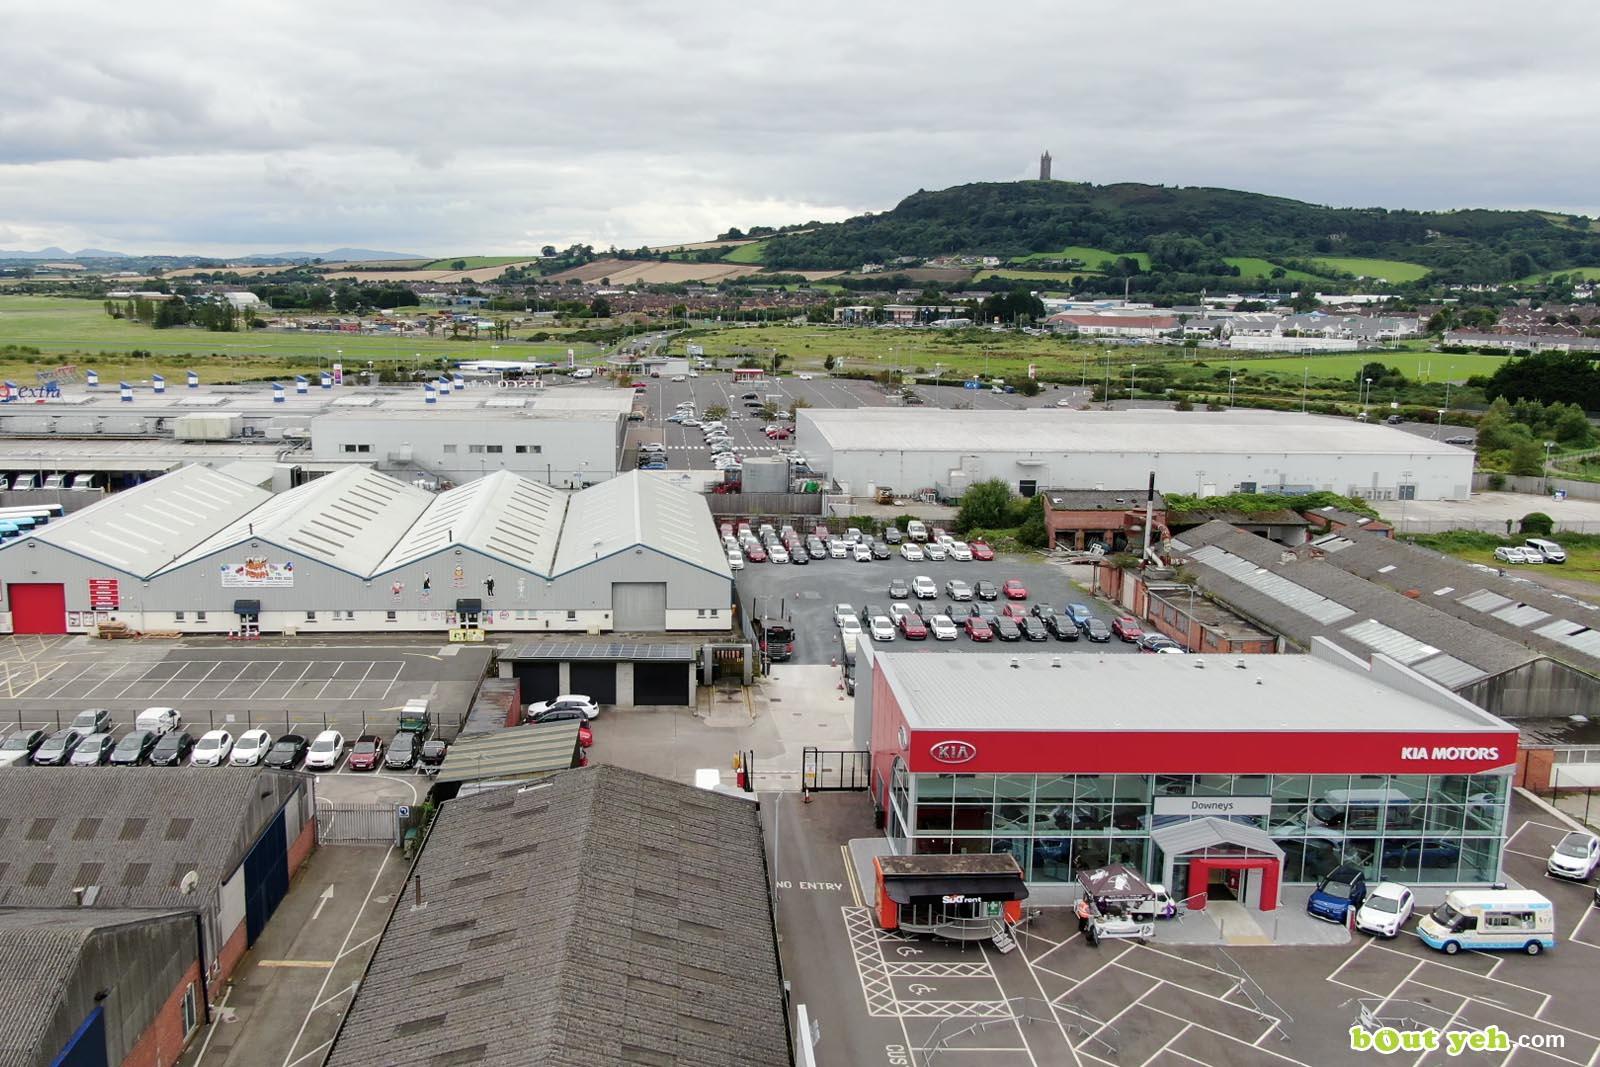 Aerial drone photography of Kia Cars Newtownabbey by Bout Yeh aerial drone photographers, Belfast, Northern Ireland - screenshot 2